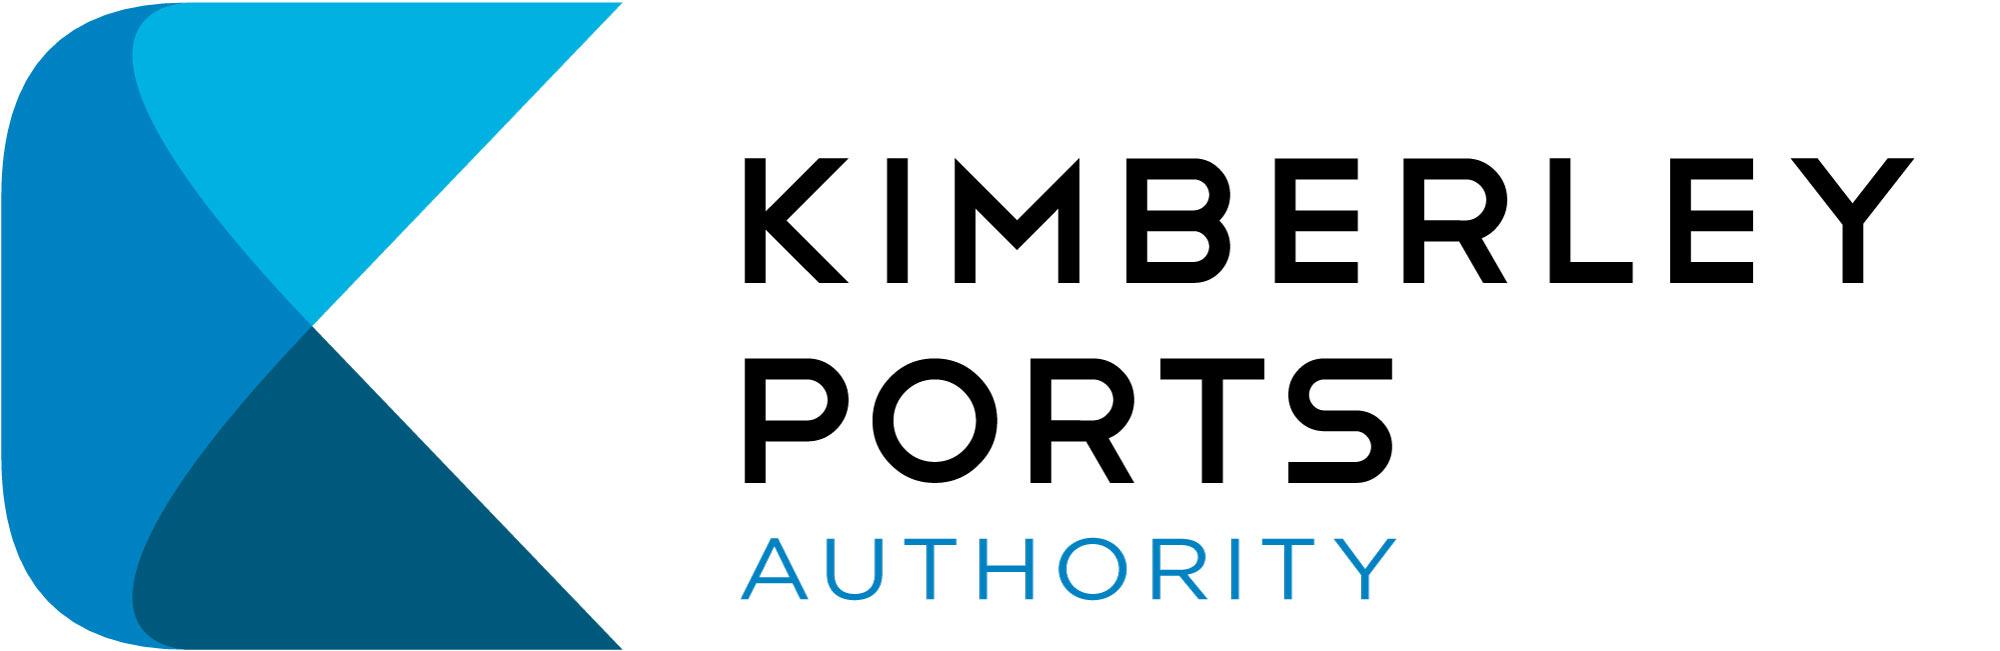 Kpa formal logo highres